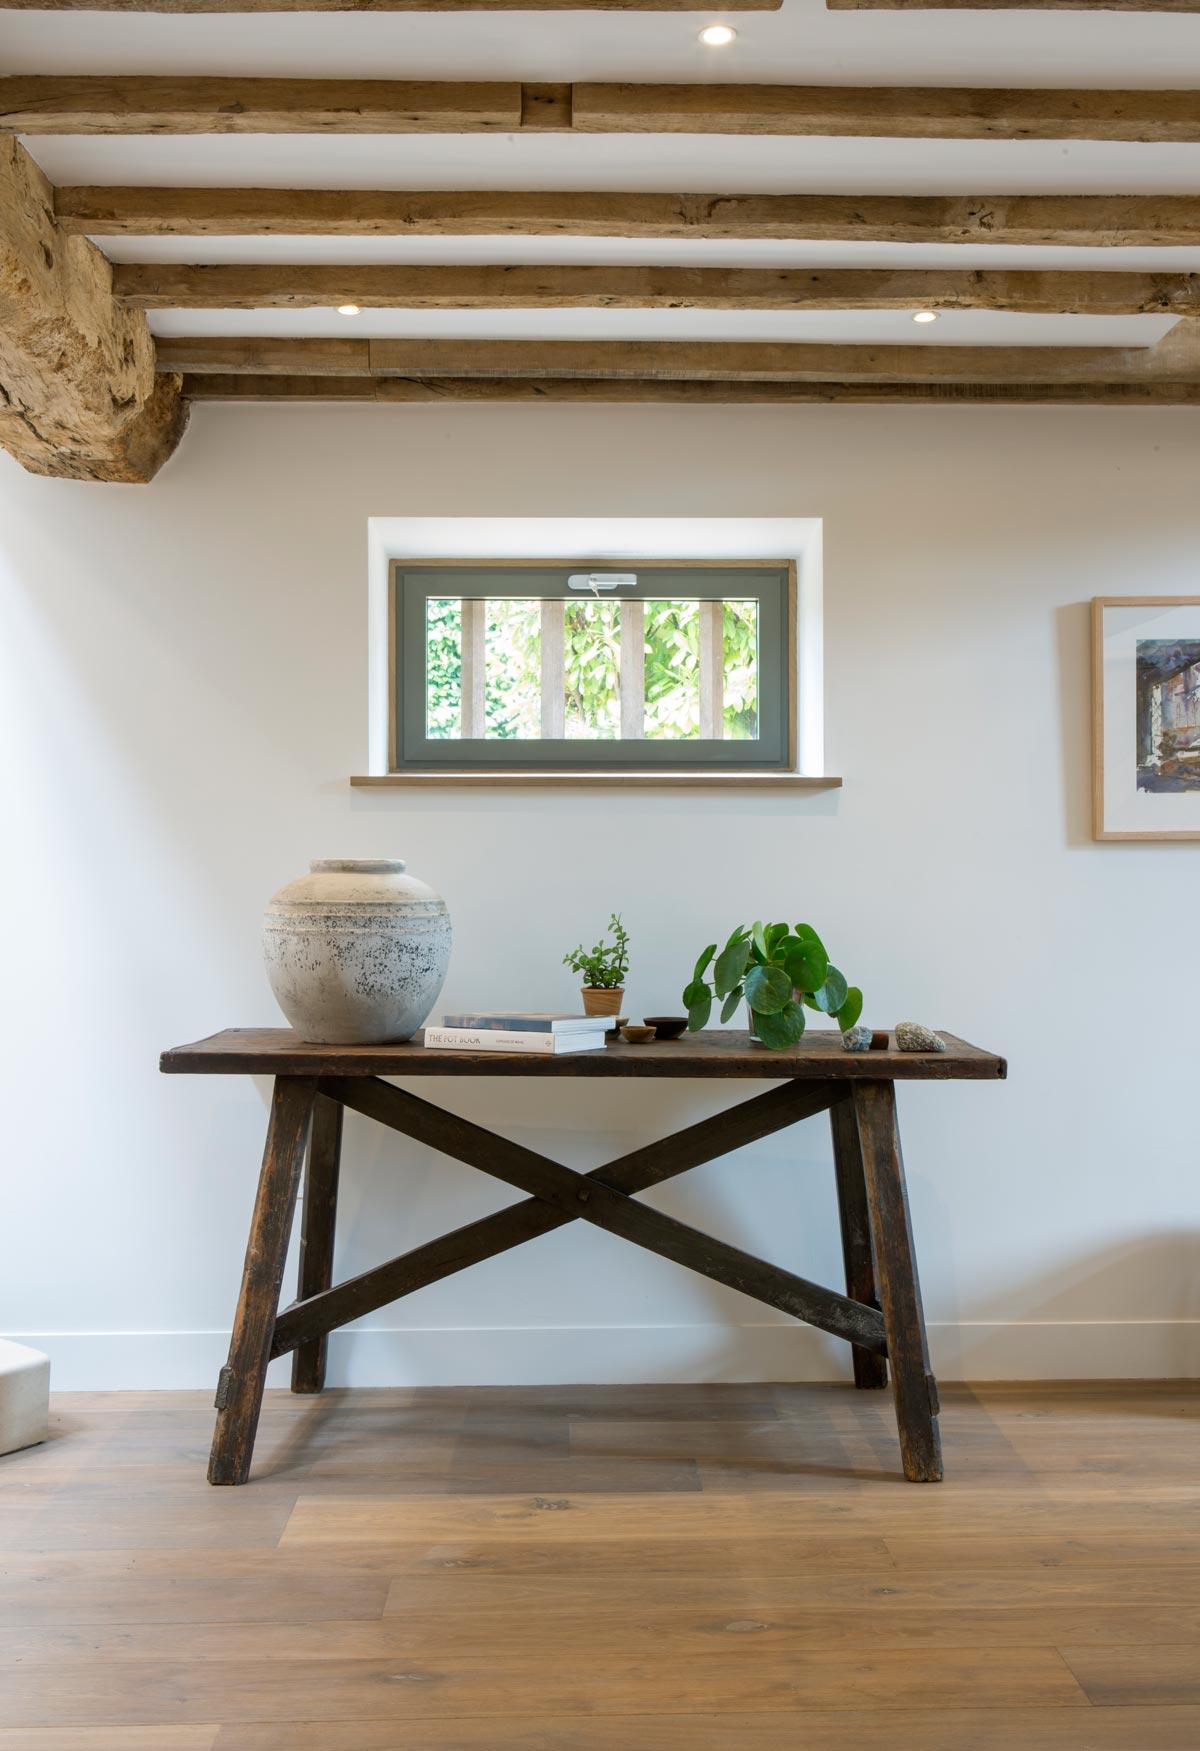 barn-conversion-3-oxfordshire-rogue-designs-1.jpg